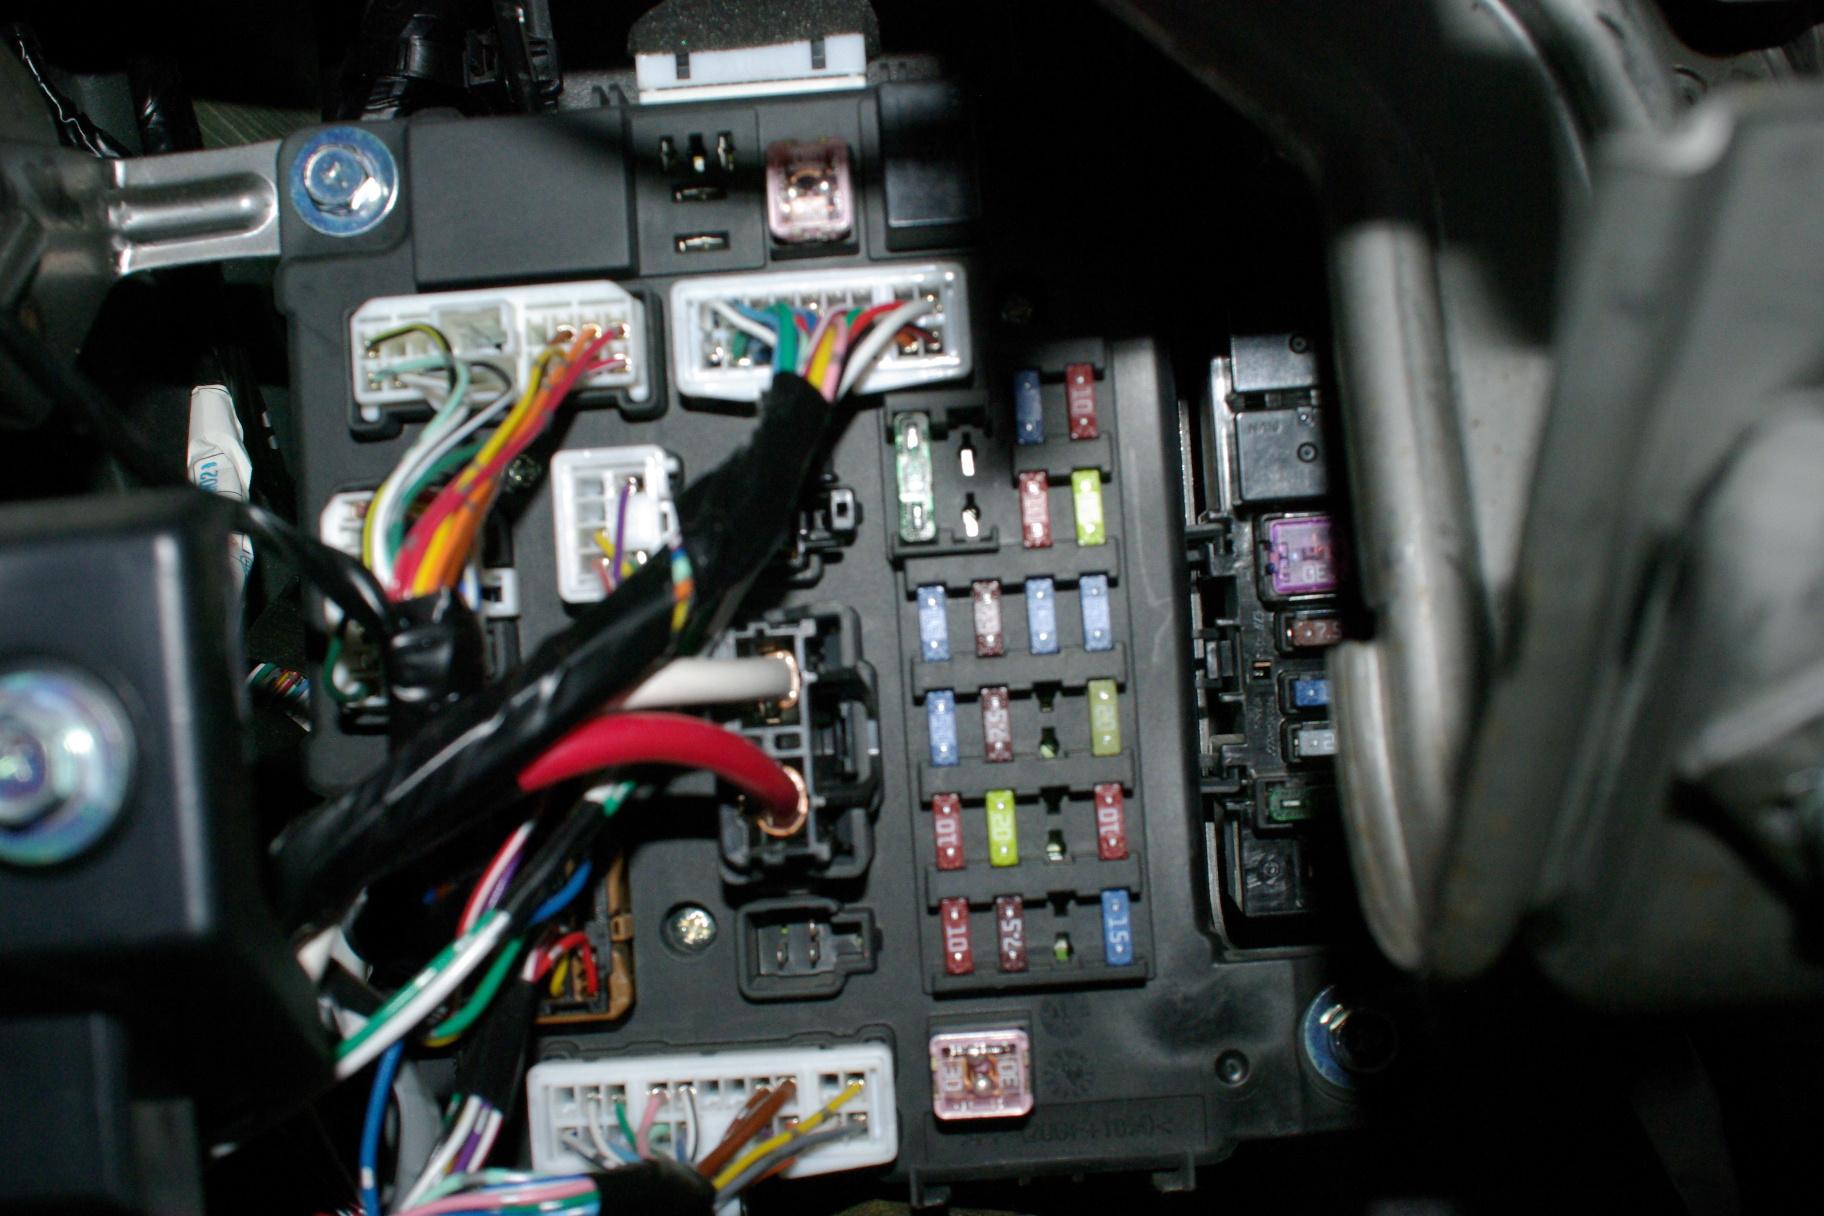 hight resolution of outlander fuse box wiring diagram fascinating mitsubishi outlander 2004 fuse box 2004 outlander fuse box